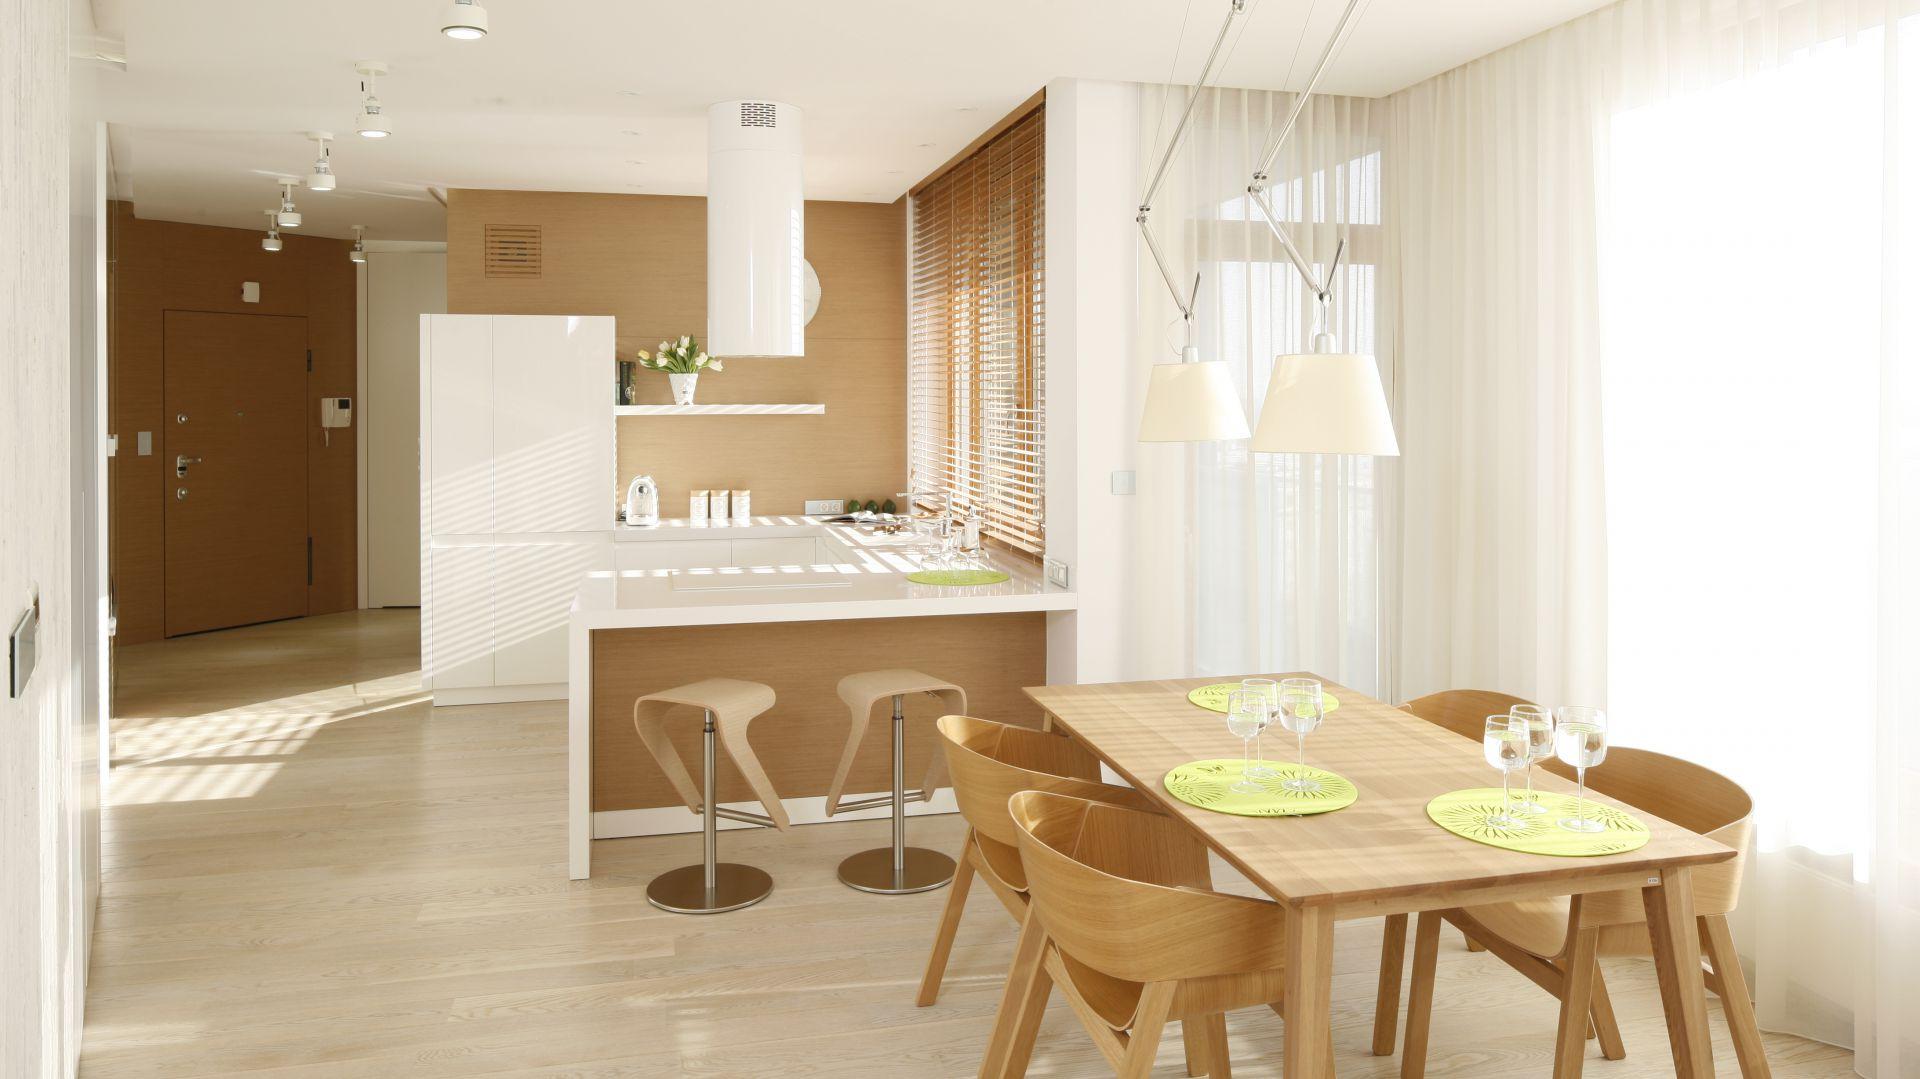 Kuchnia otwarta na salon  Kuchnia otwarta na salon   -> Kuchnia Otwarta Projekt